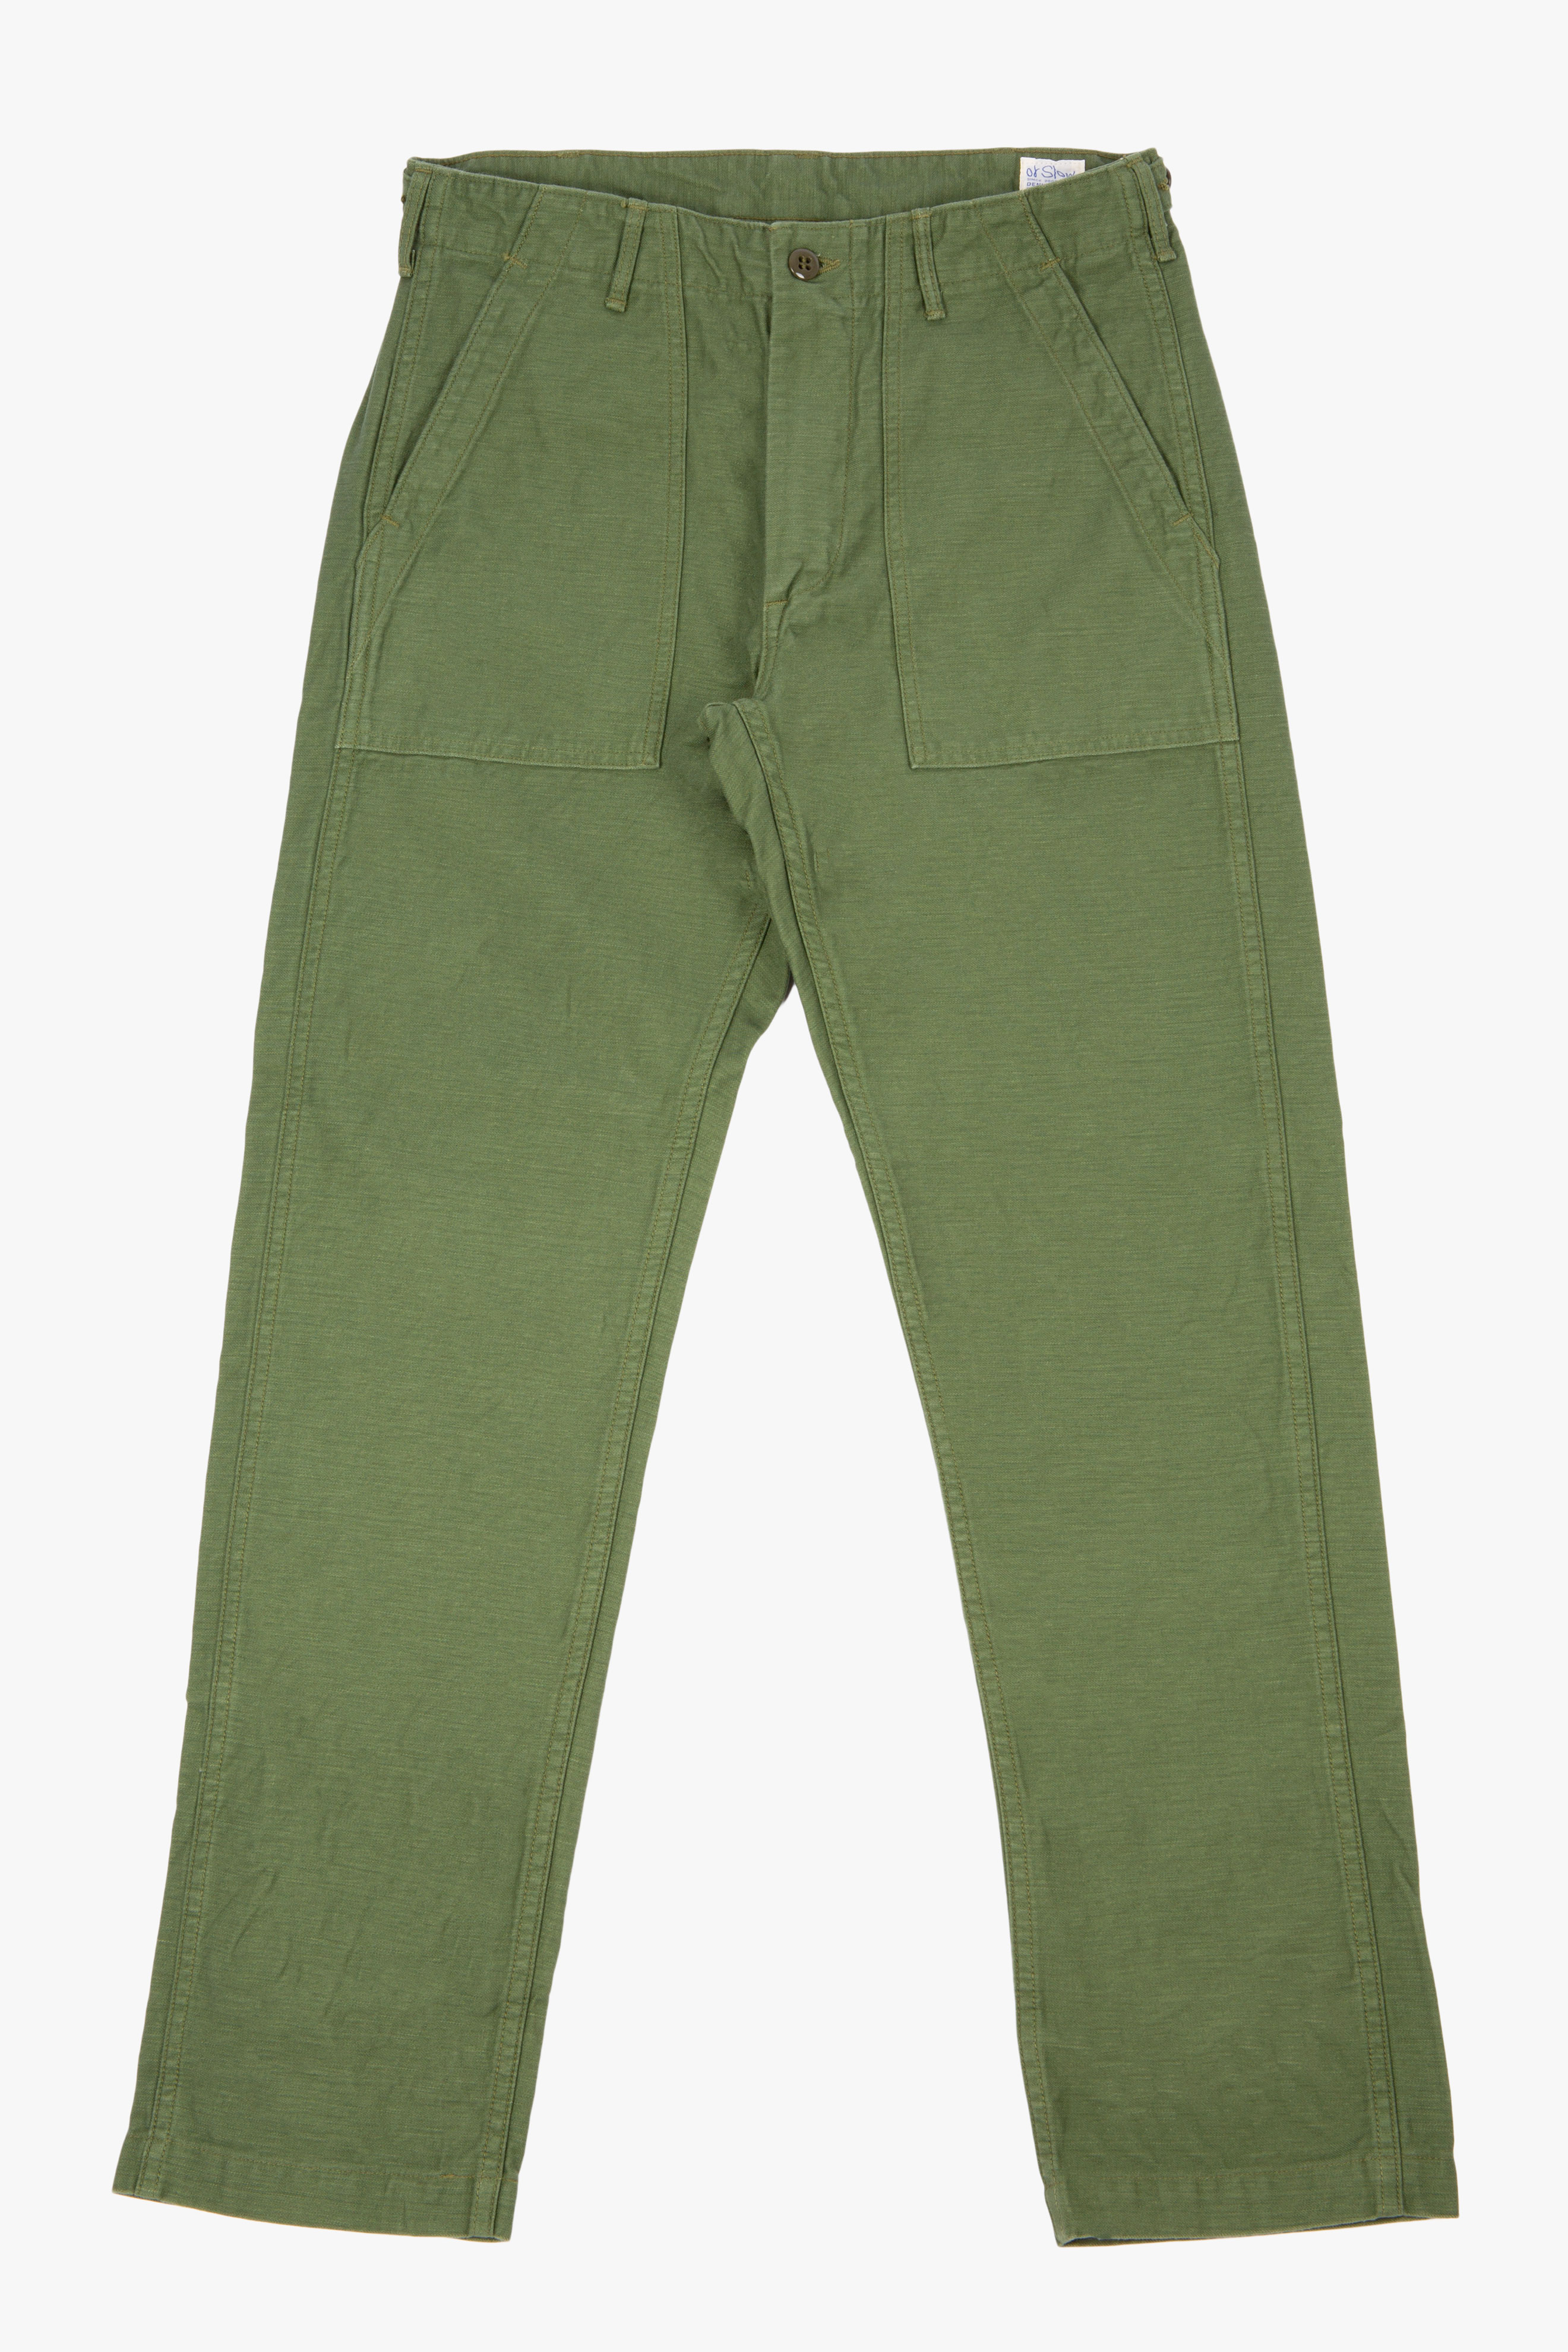 US Army Fatigue Pant Green